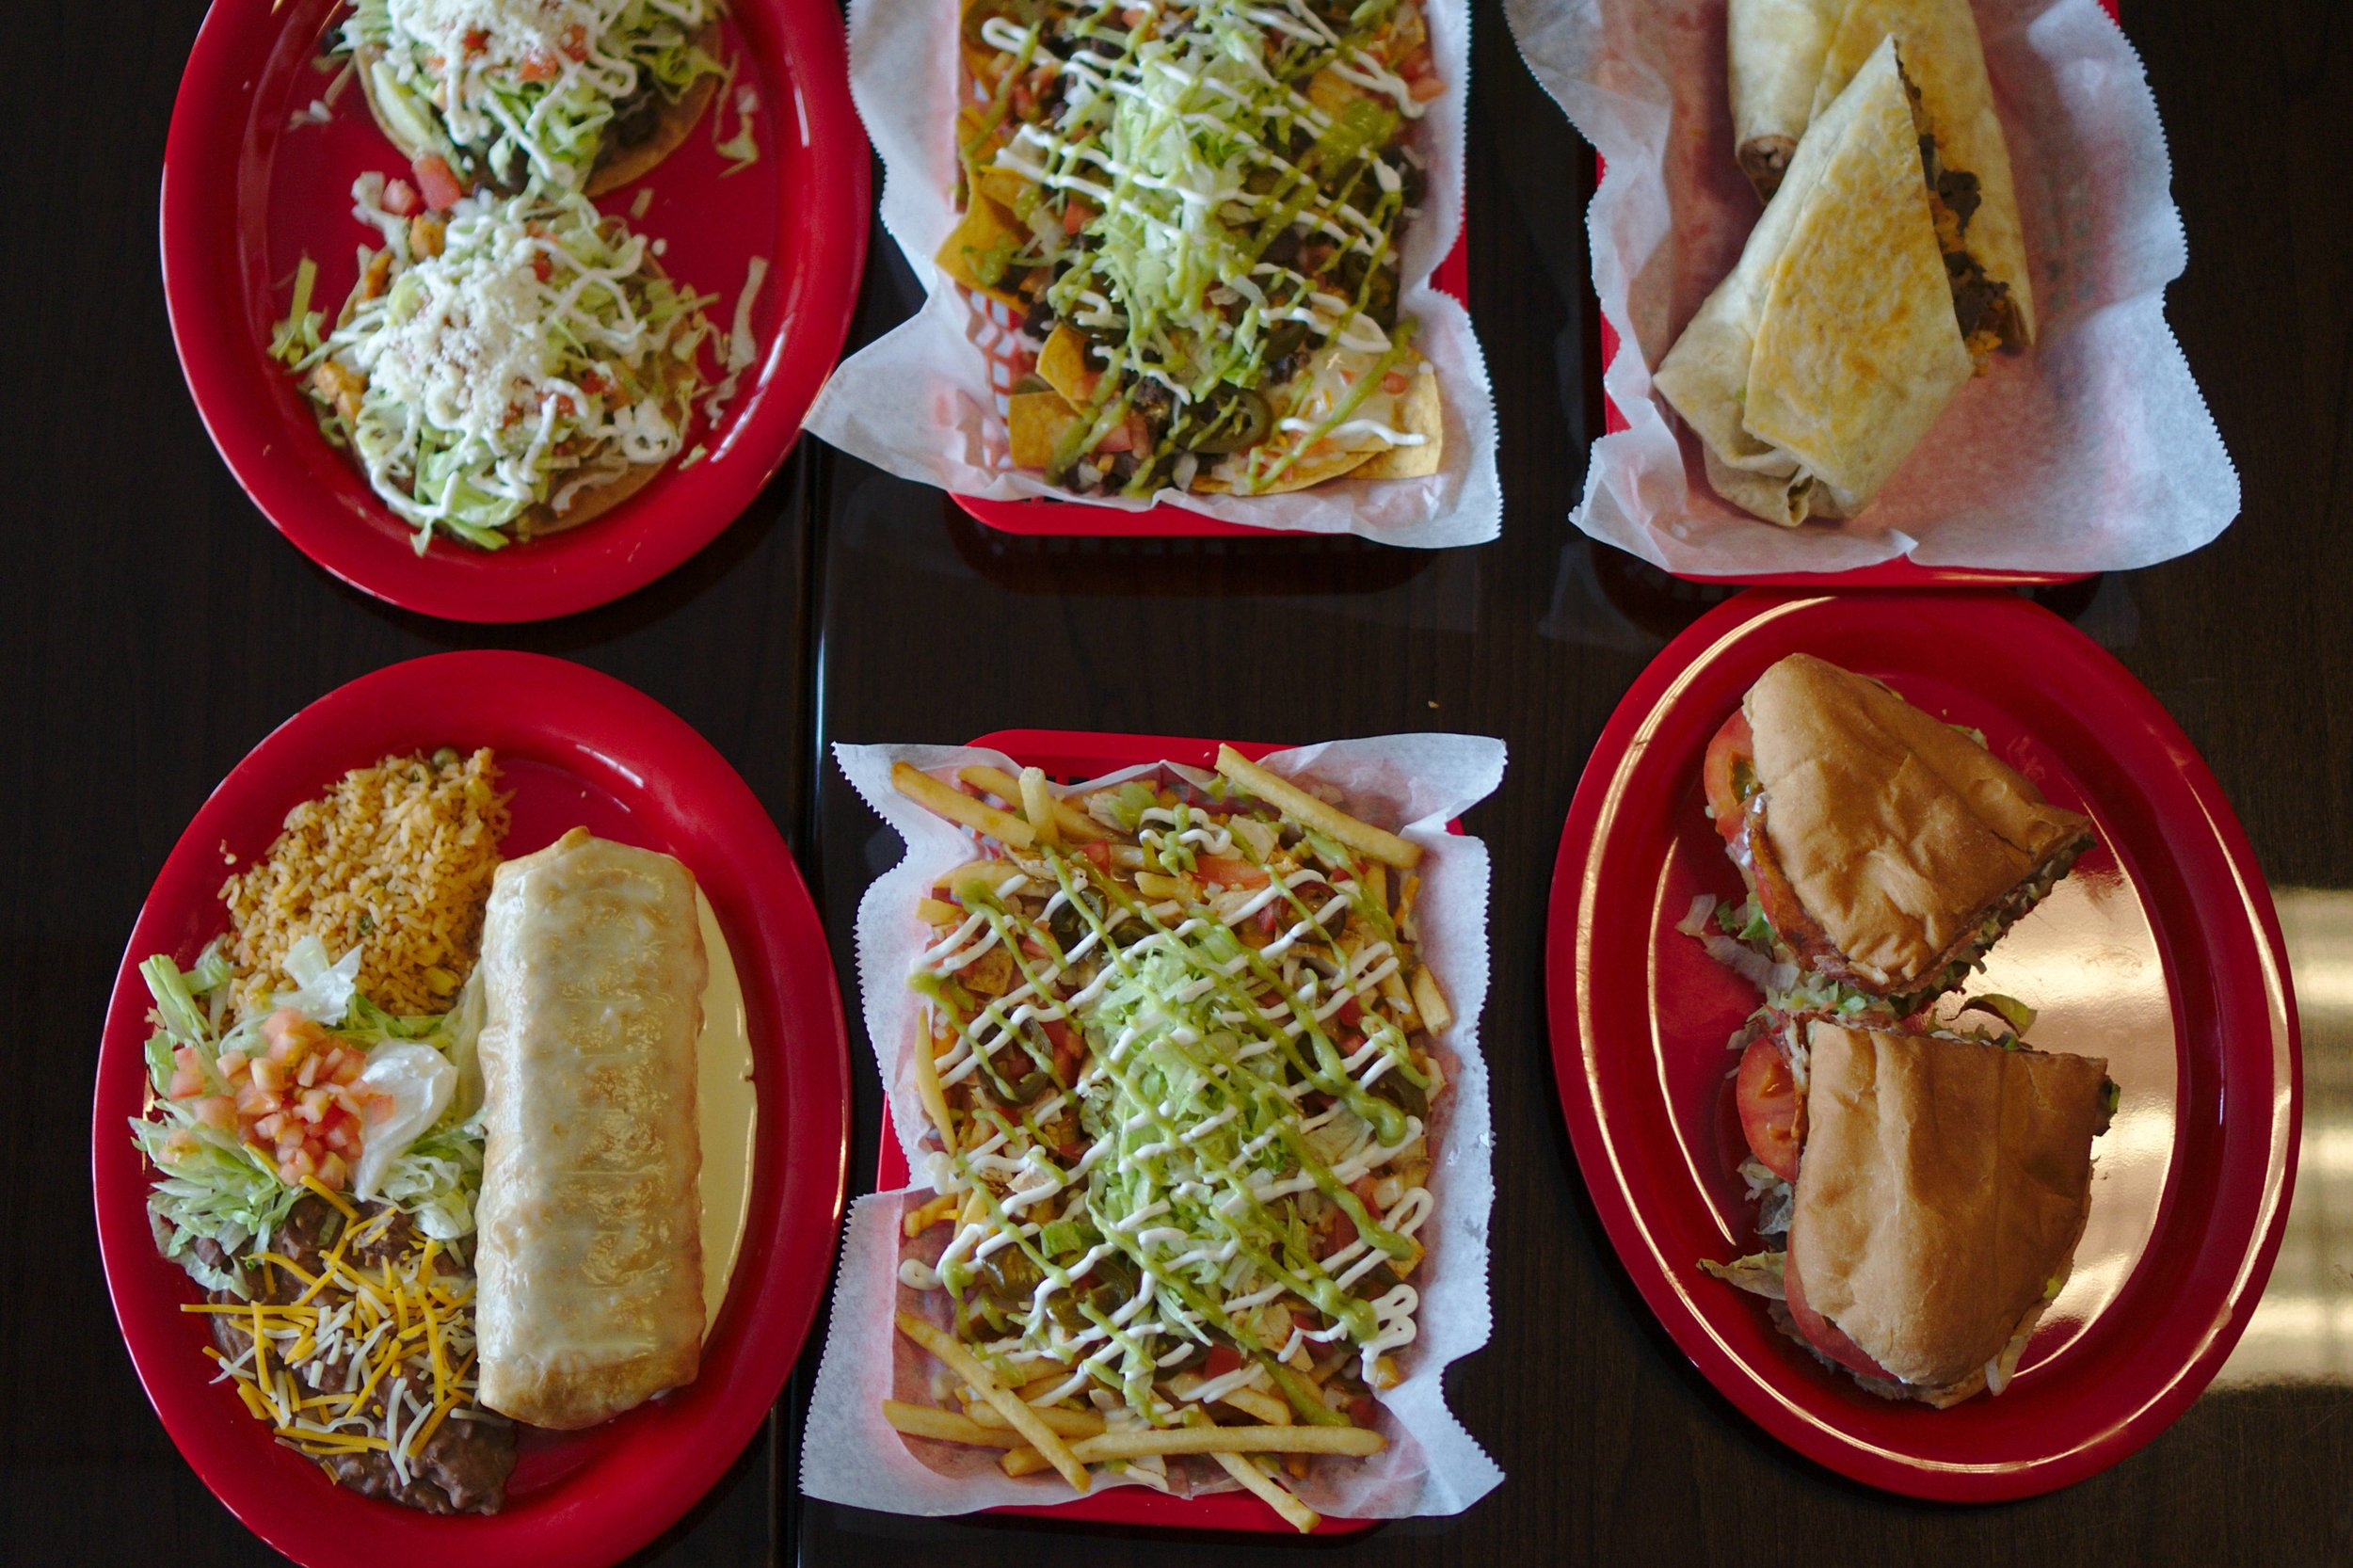 Toastadas, Chimichanga, Nachos, Queso Fries, Burrito and Tortas